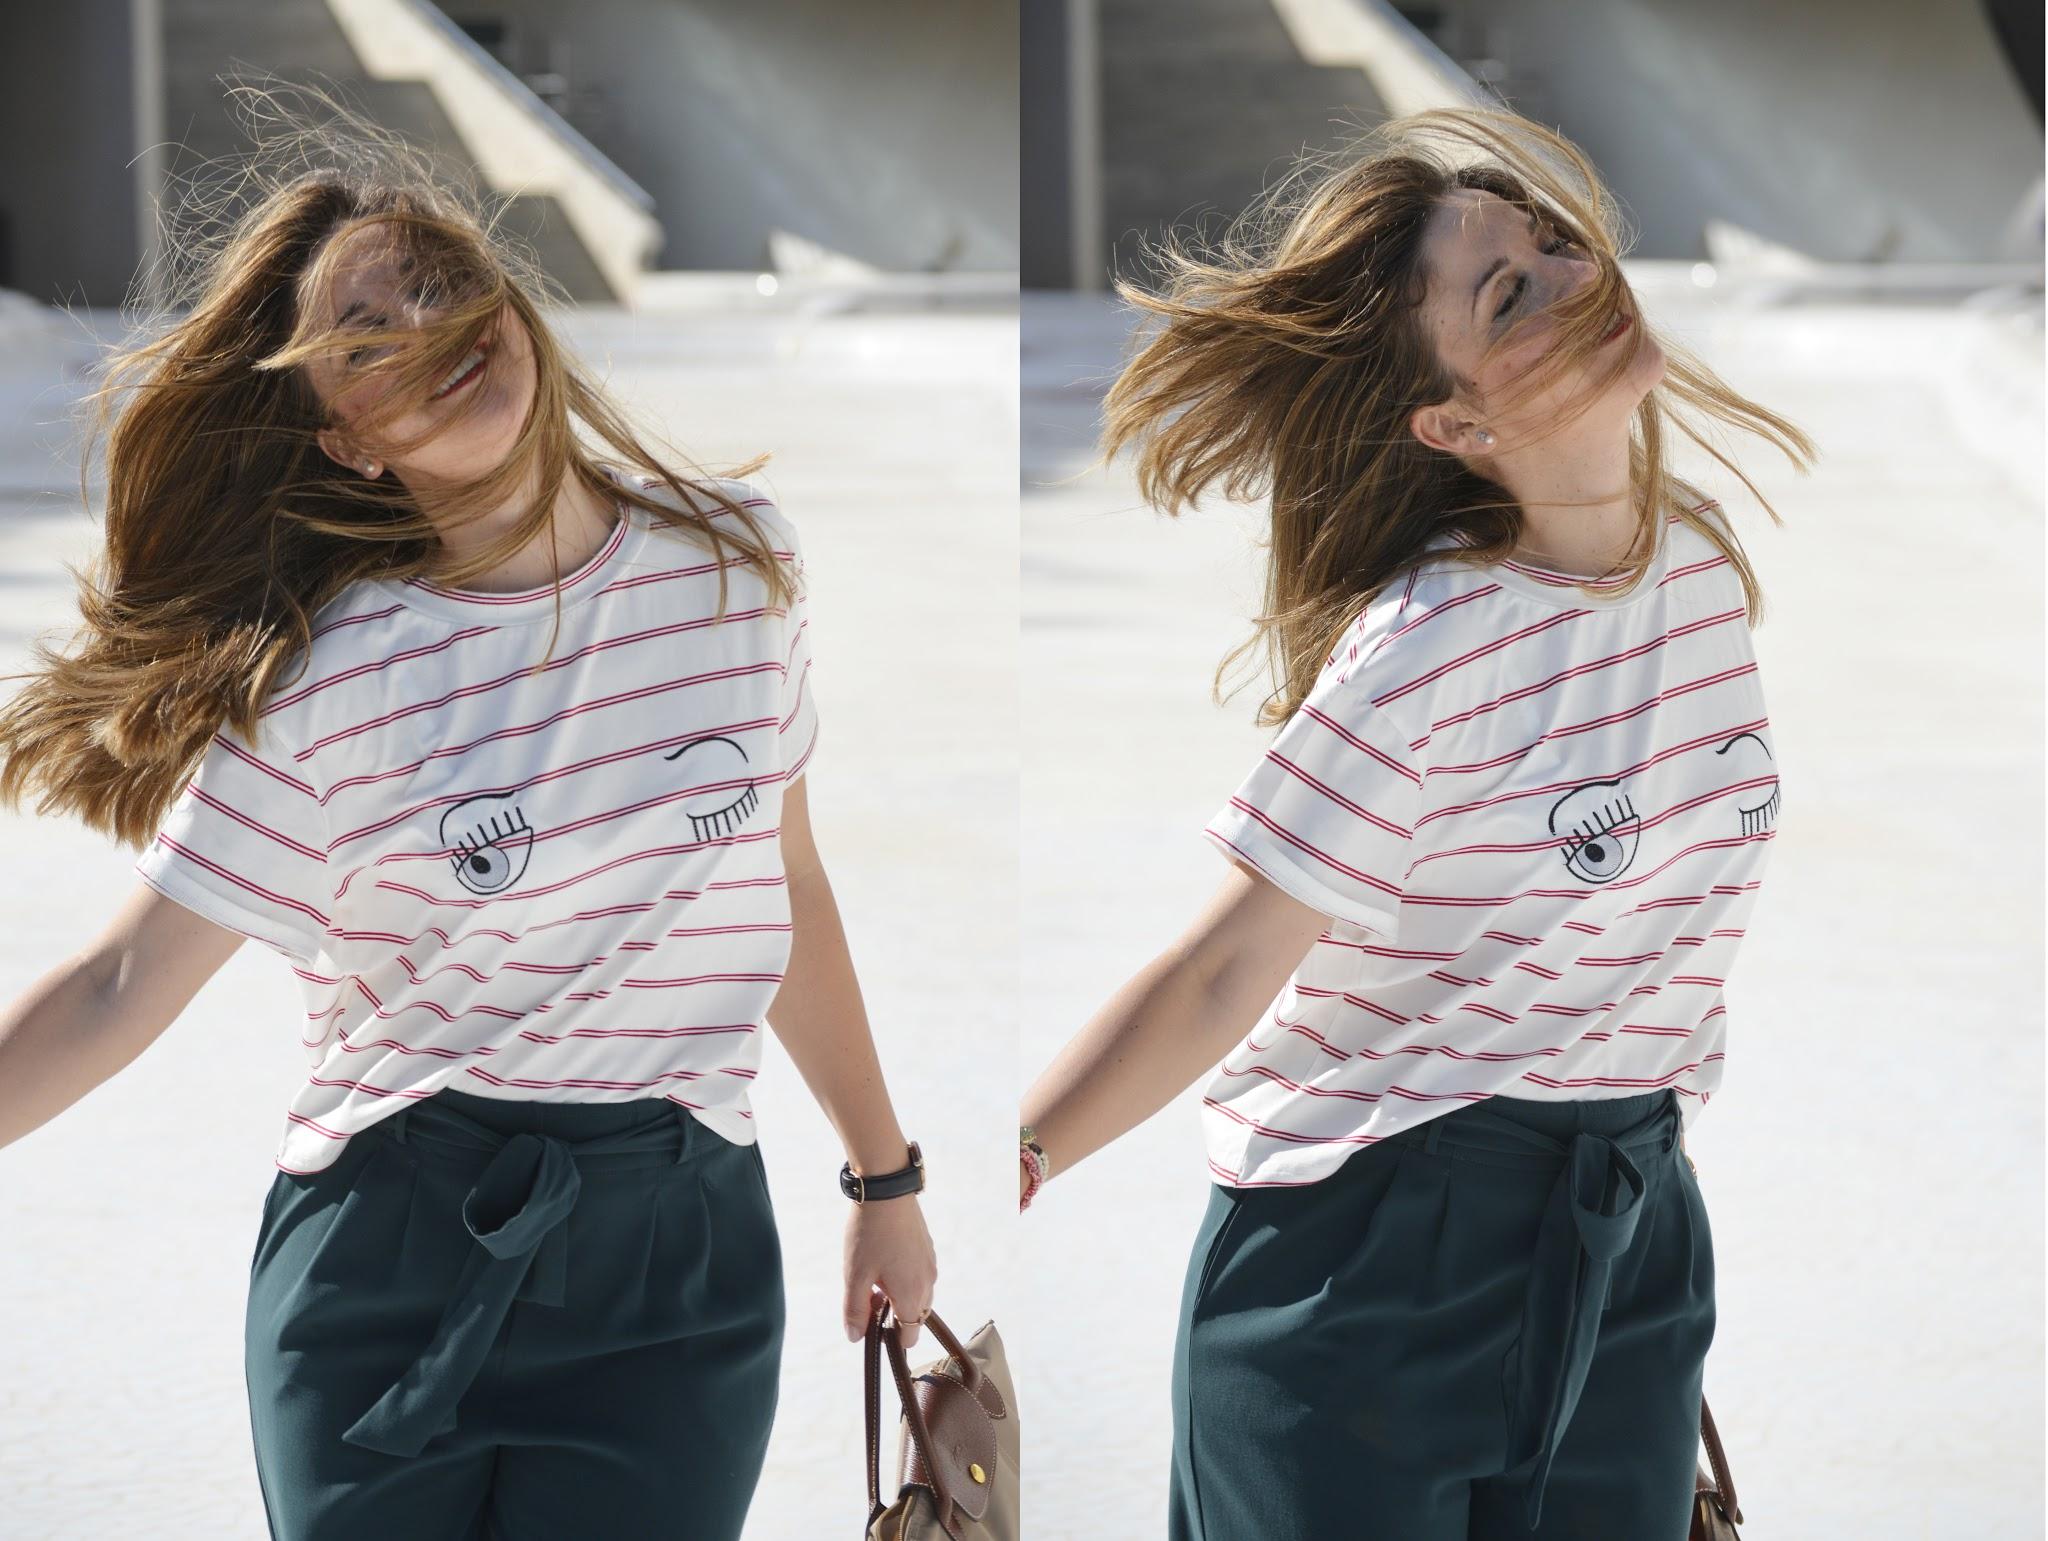 tshirt_eyelash_women_shein_trendy_fashion_tarasessence